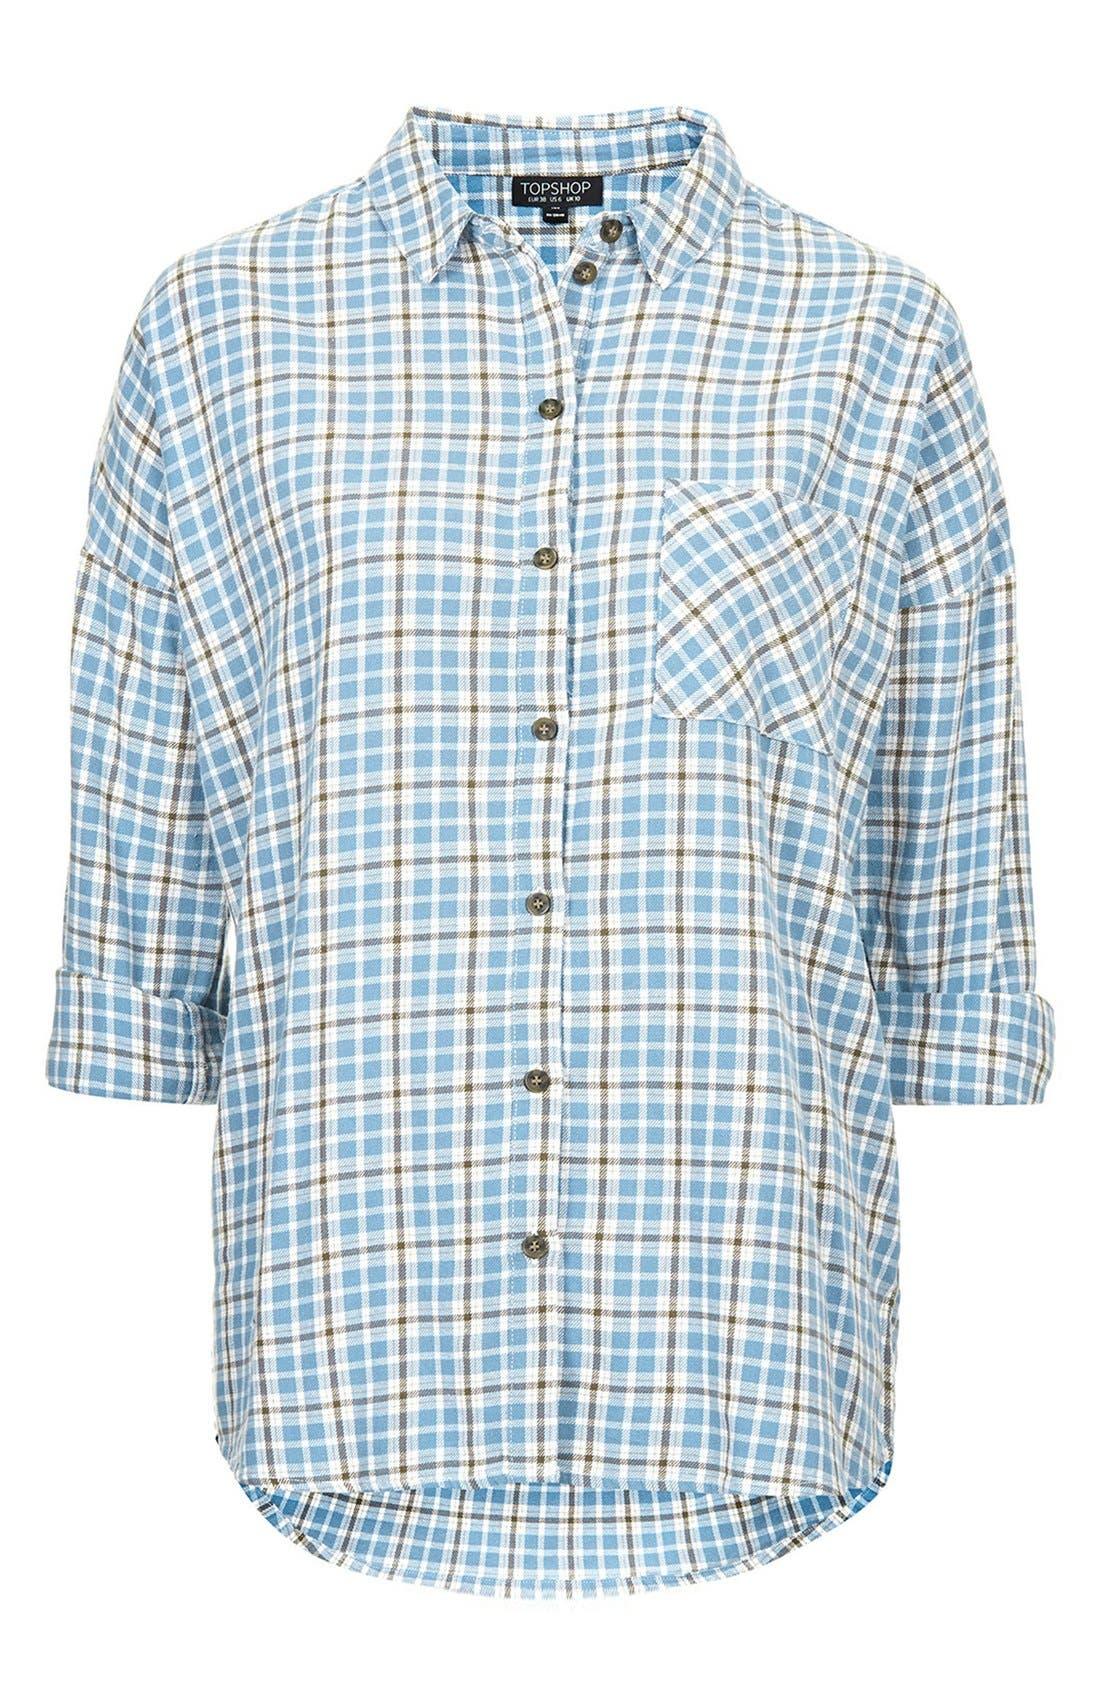 Alternate Image 3  - Topshop 'George Bobbi' Oversize Check Shirt